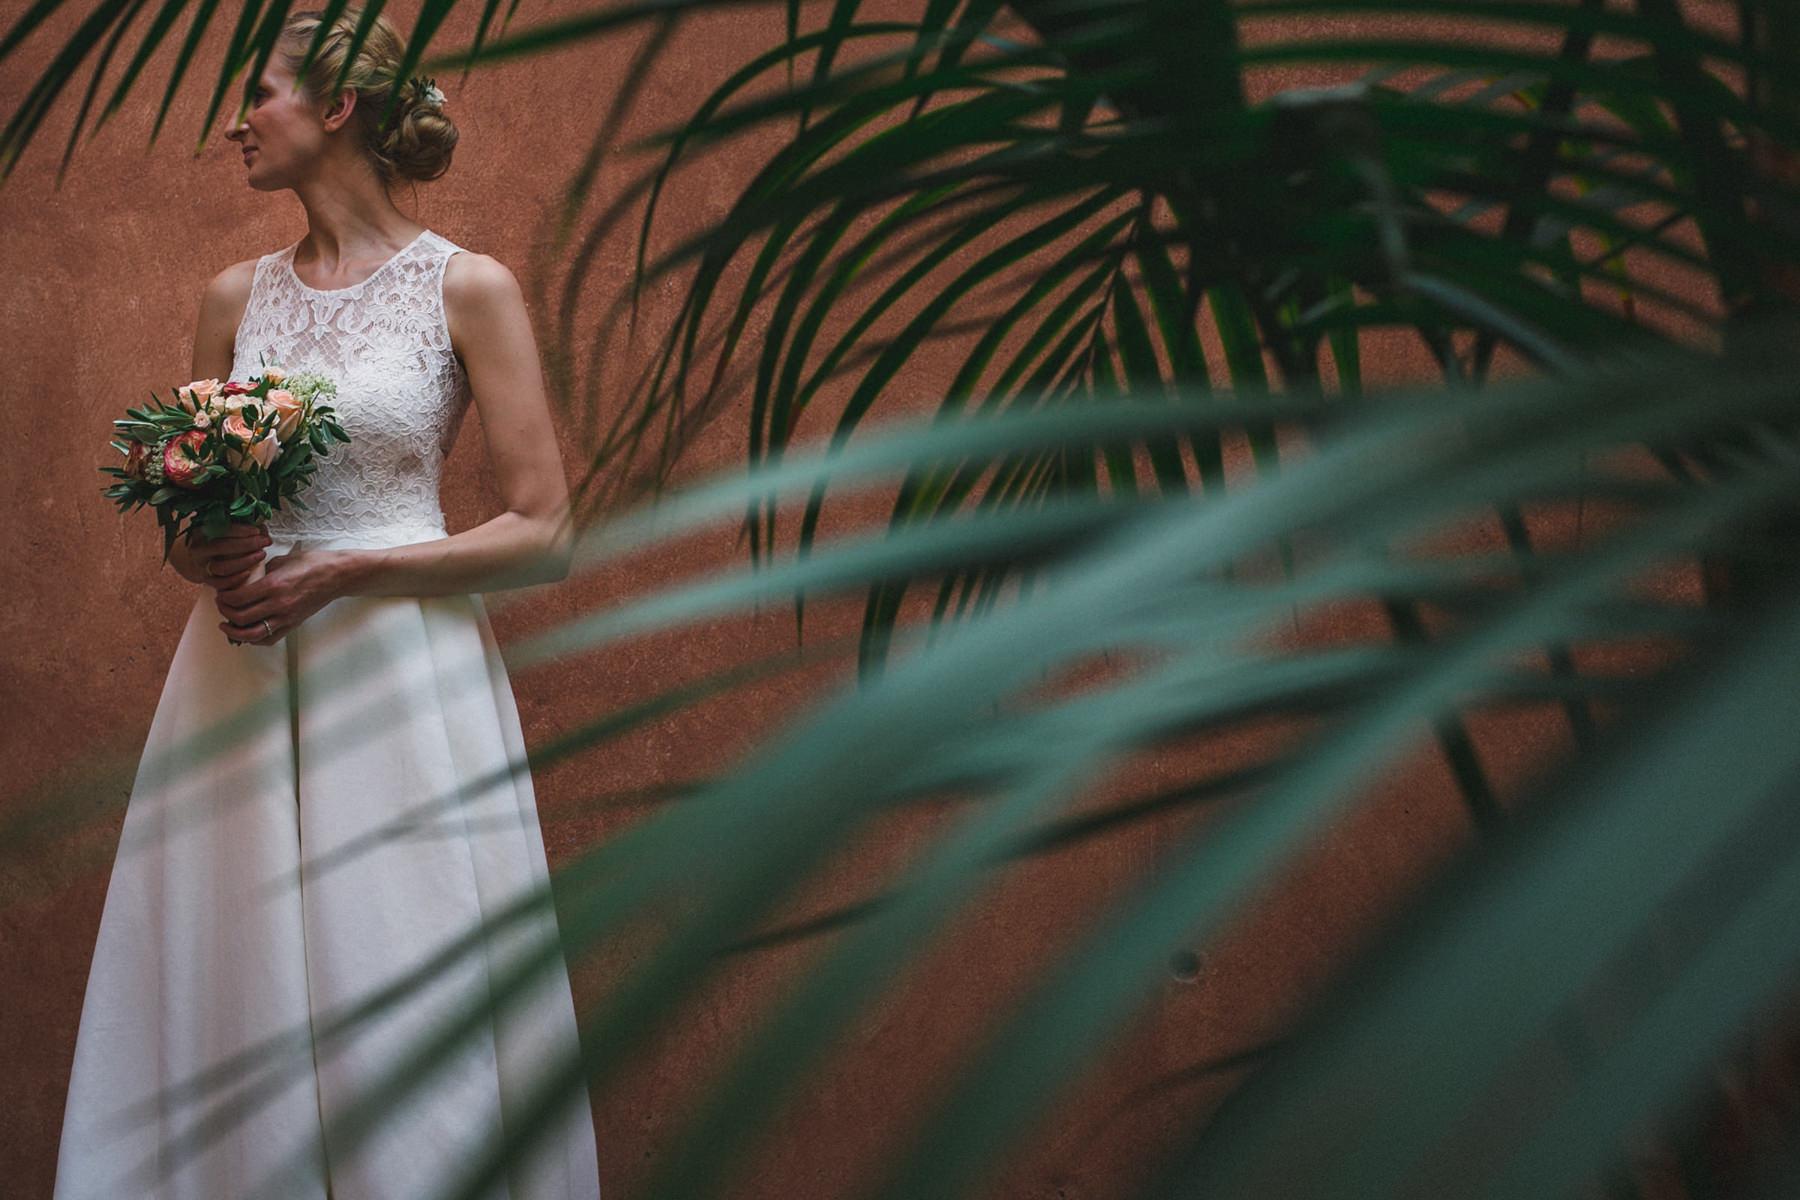 Wedding_Photography_Carlos_Hevia_Barcelona_Berlin_36.jpg